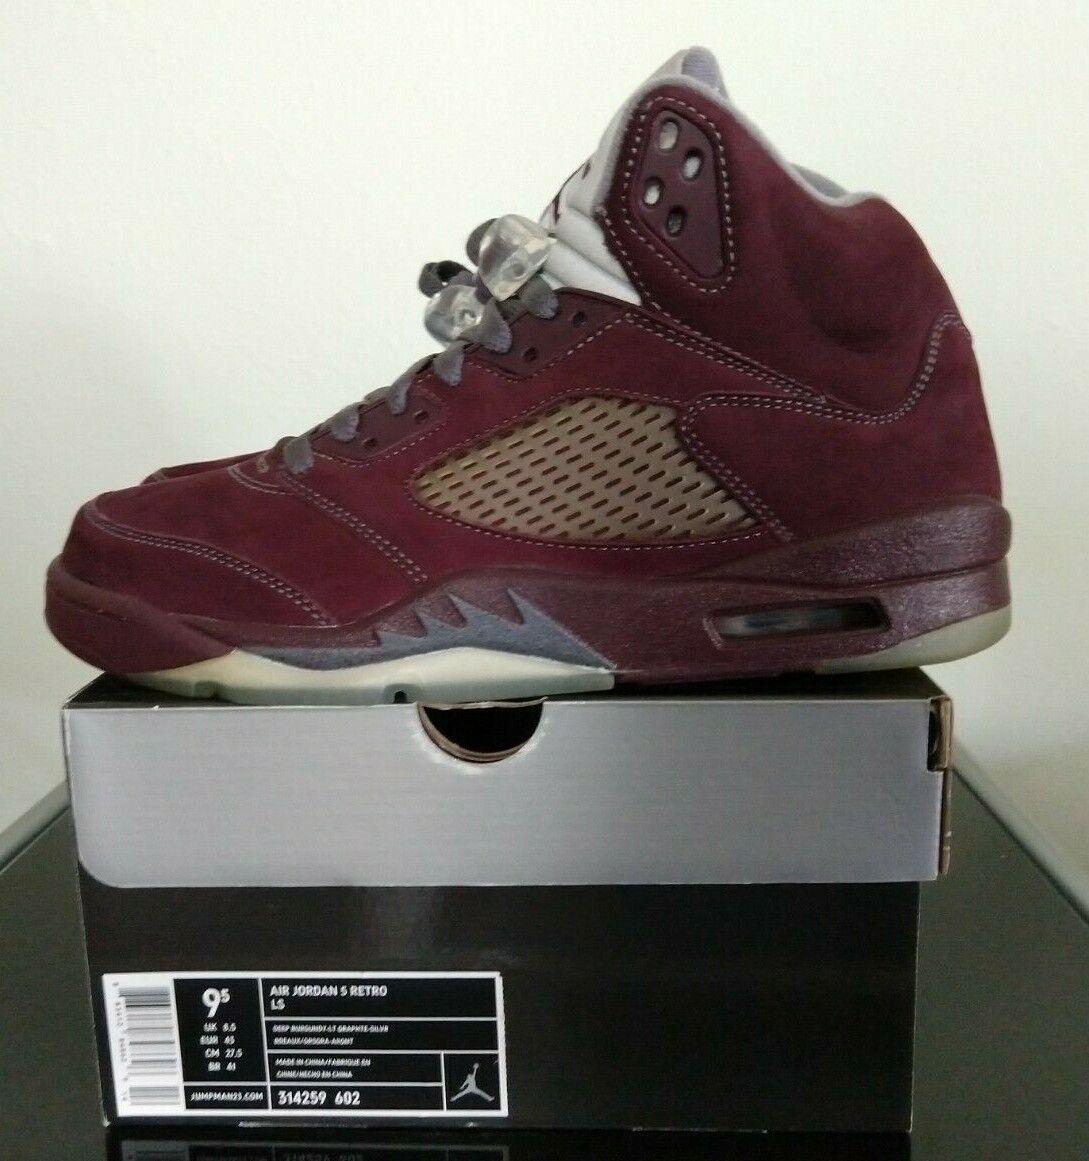 663267cc439ad4 DS Nike Air Jordan 5 Retro LS 314259-602 Deep Burgundy Graphite ...